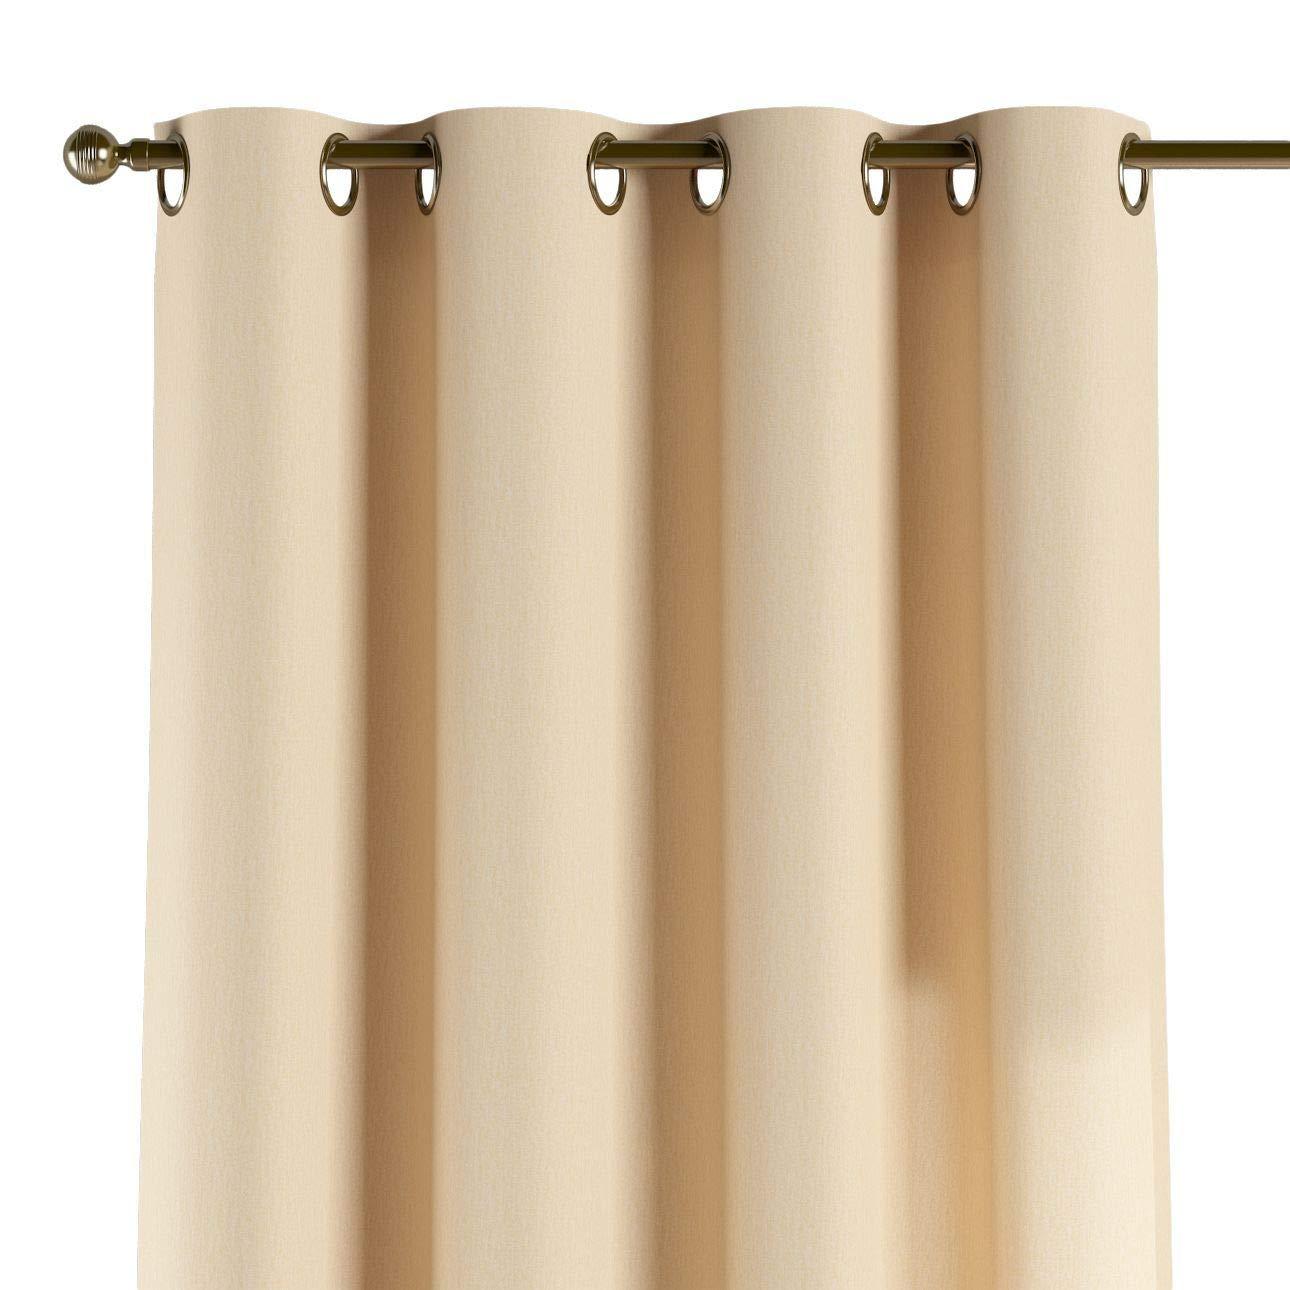 Dekoria Ösenschal Dekoschal Blickdicht 1 Stck. 130 × 260 cm vanille Maßanfertigung möglich